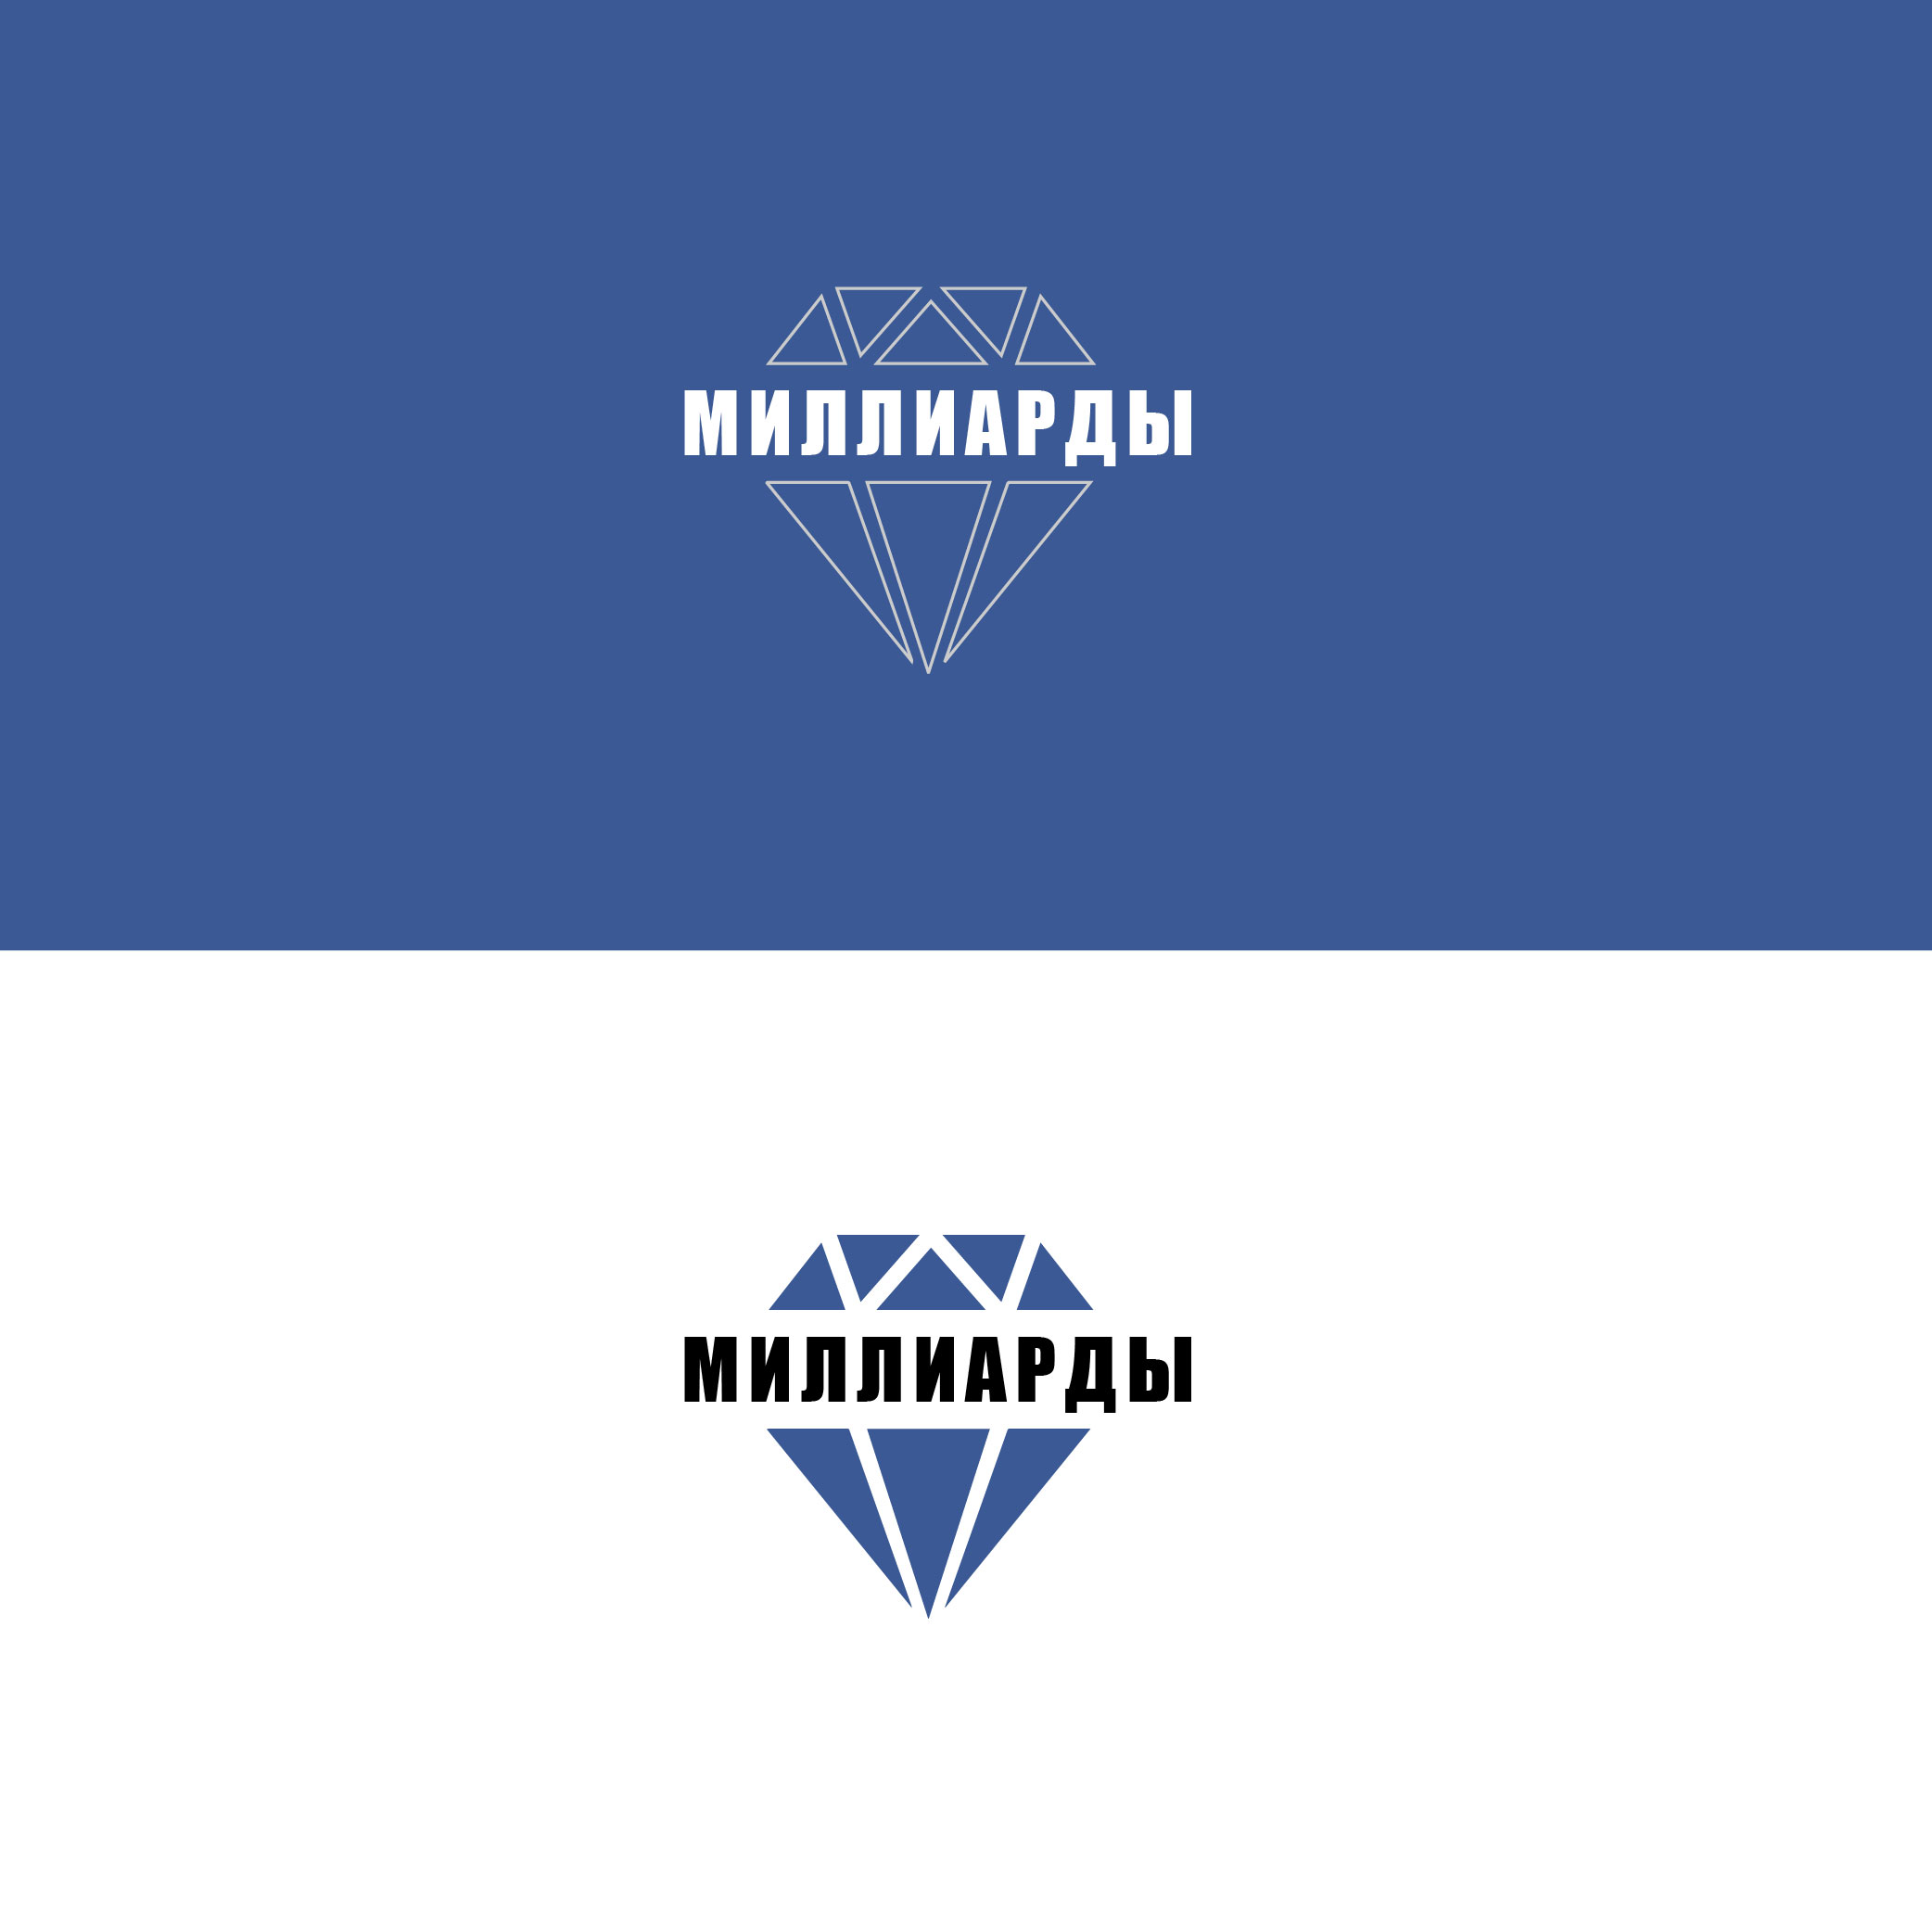 Создание логотипа фото f_0465e407408edbd2.jpg